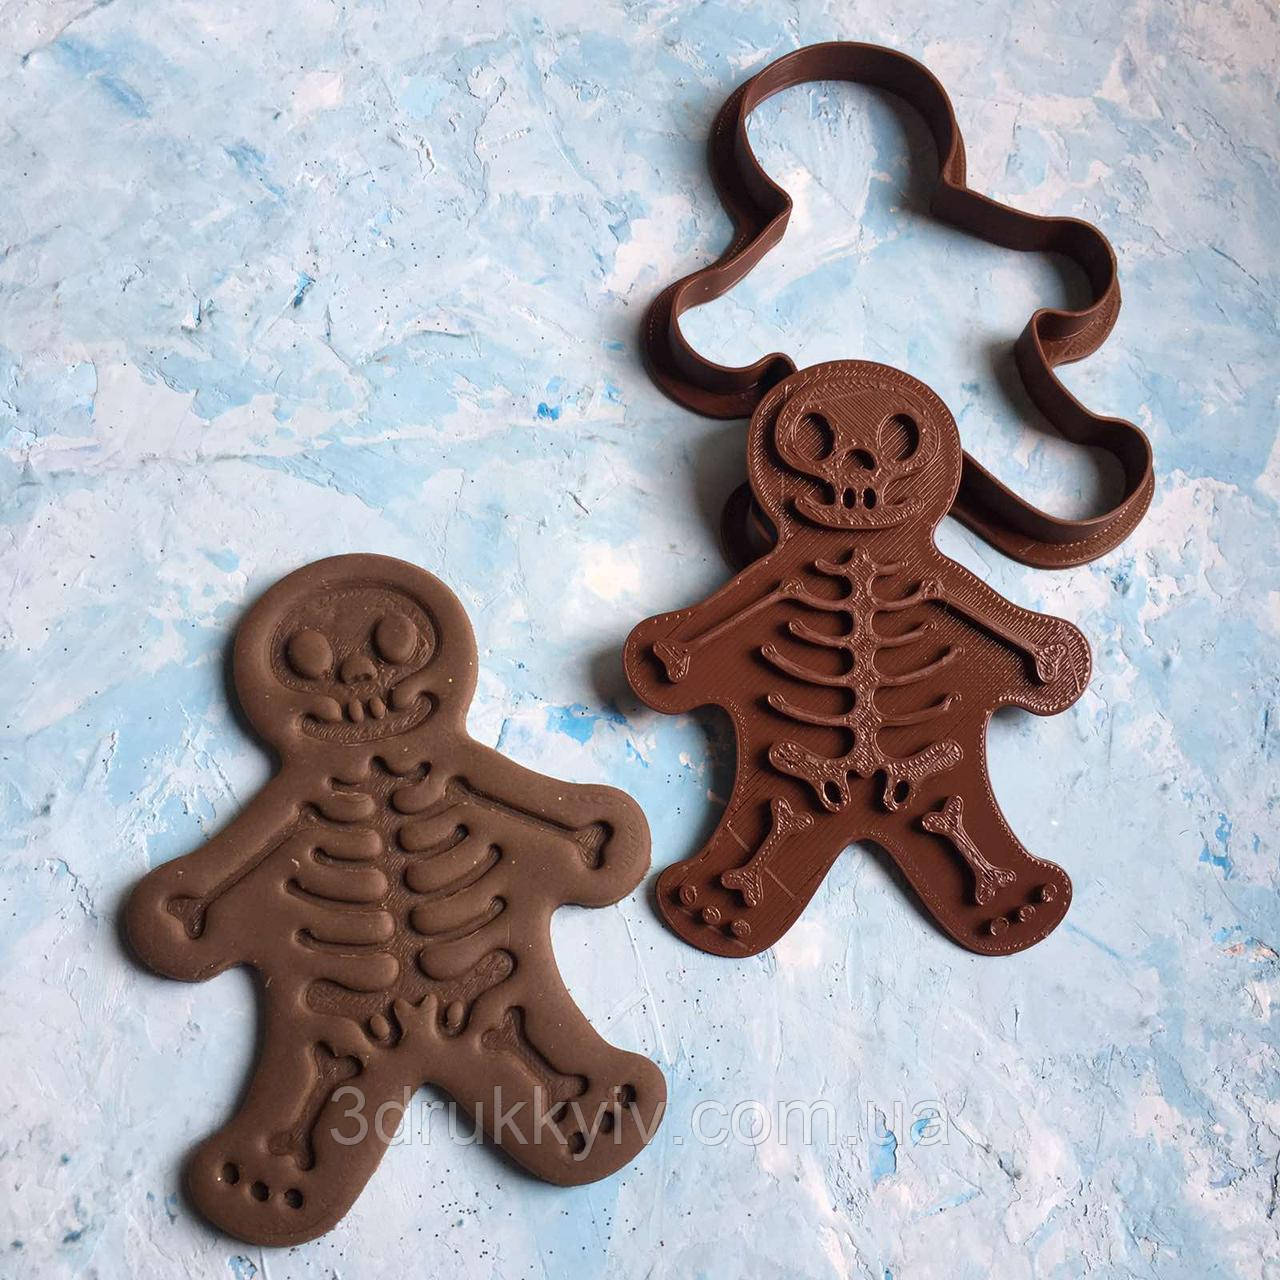 "Вирубка для пряників зі штампом  ""Скелет #1"" / Вырубка - формочка для пряников со штампом ""Скелет #1"""